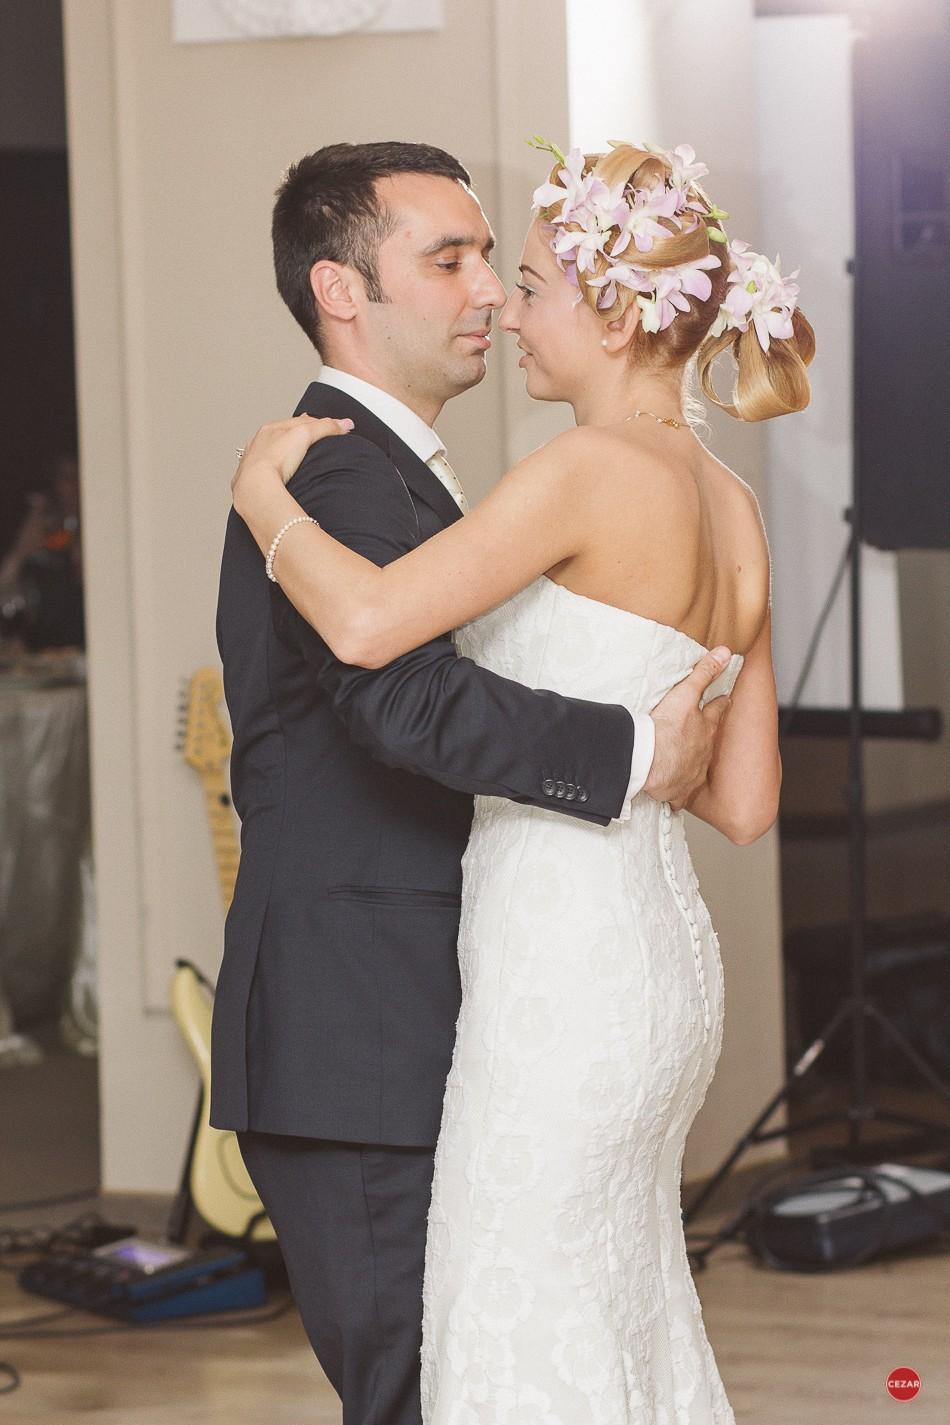 nunta attila si andreea fotograf licentiat profesionist de nunta fotografie creativa grand hotel targu mures cluj bistrita